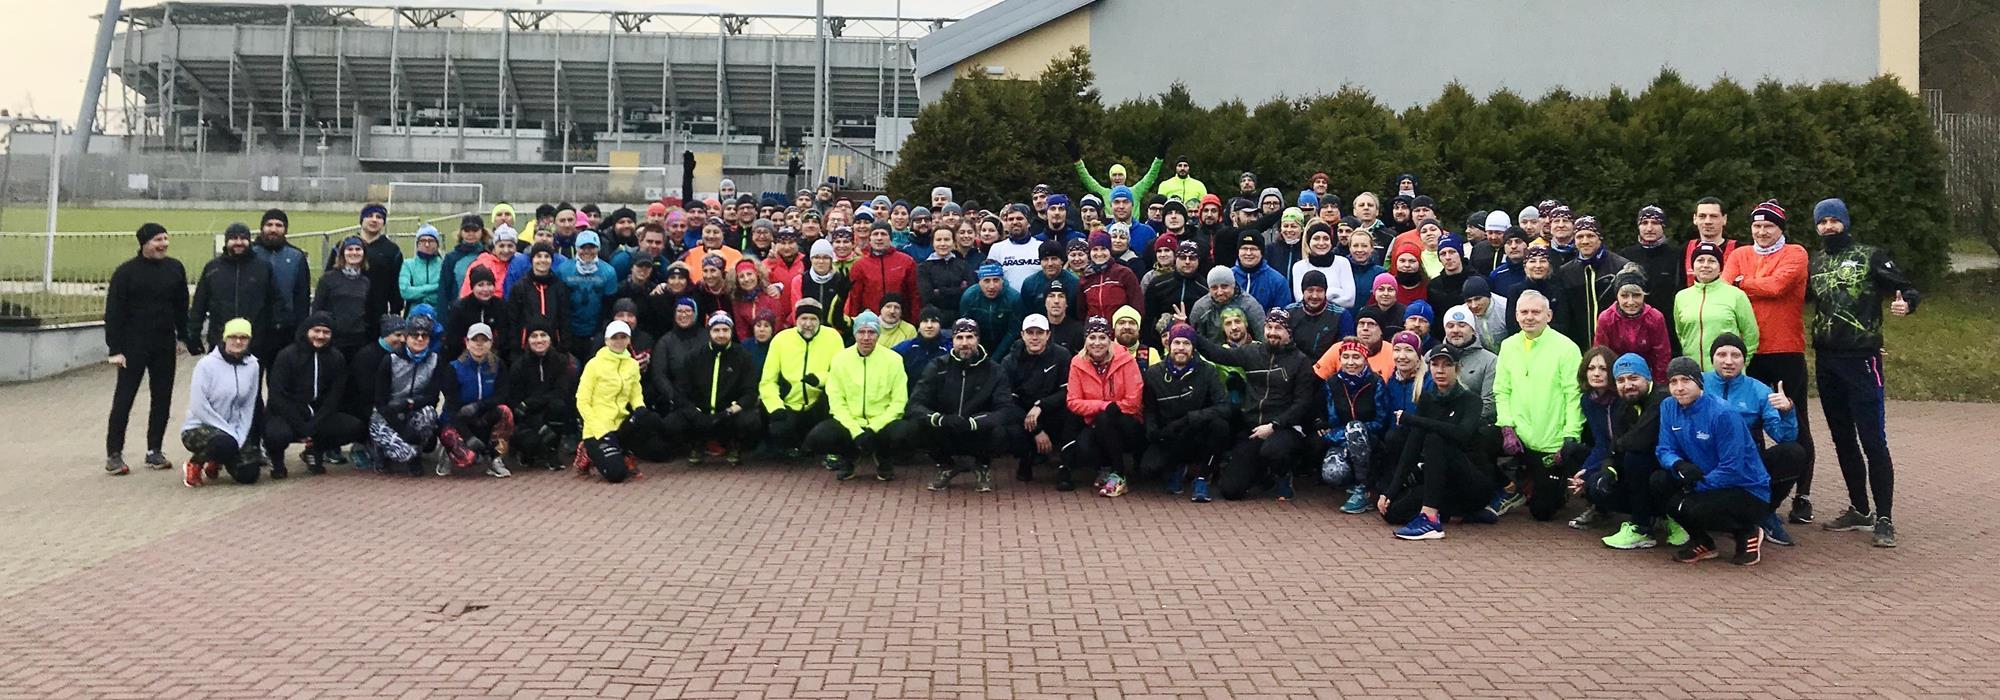 asics training plan half marathon